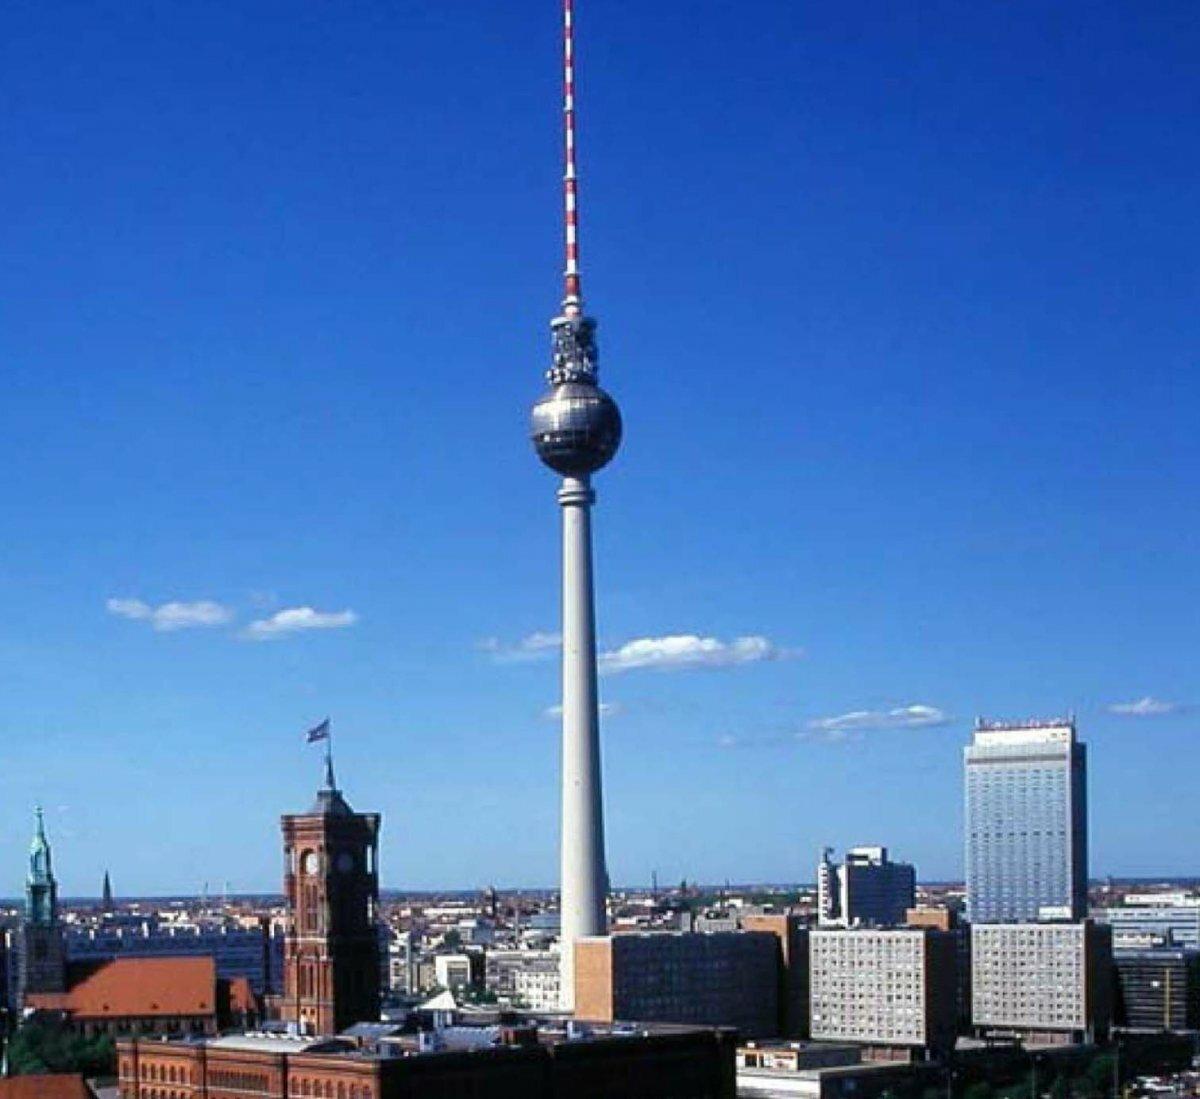 способ картинки берлинская телебашня лава